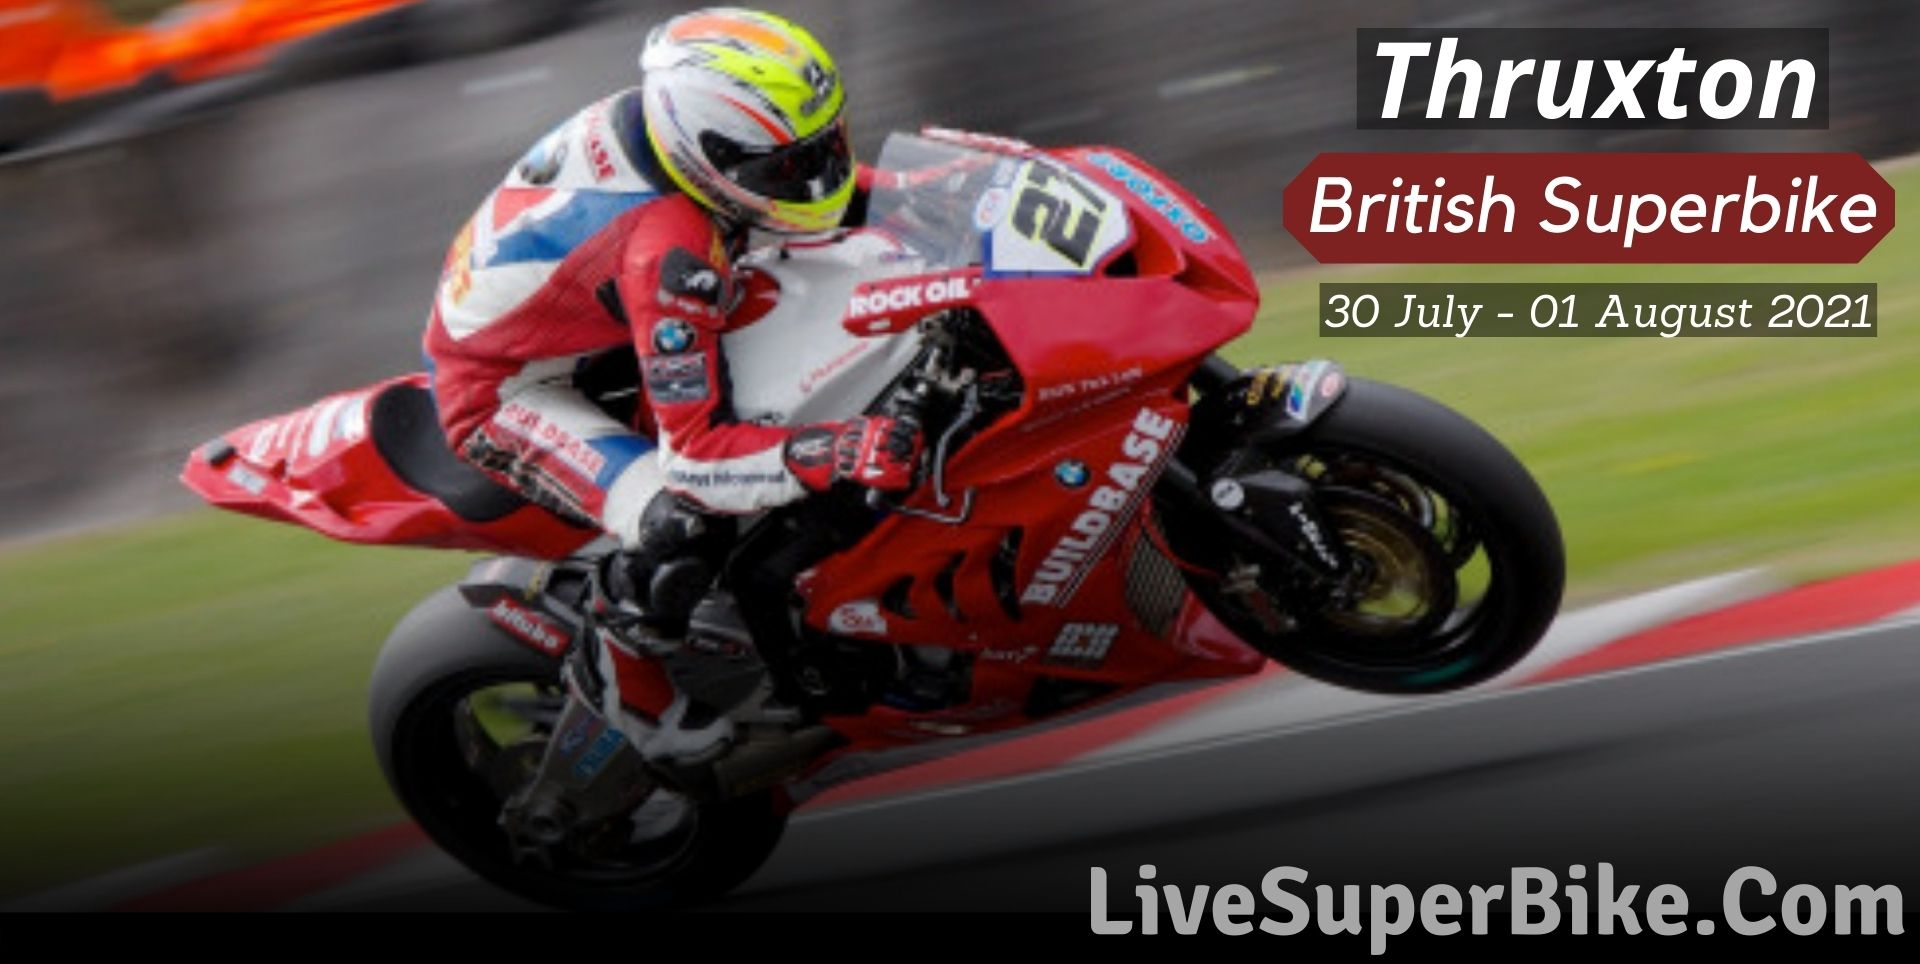 Thruxton British Superbike Live Stream 2021